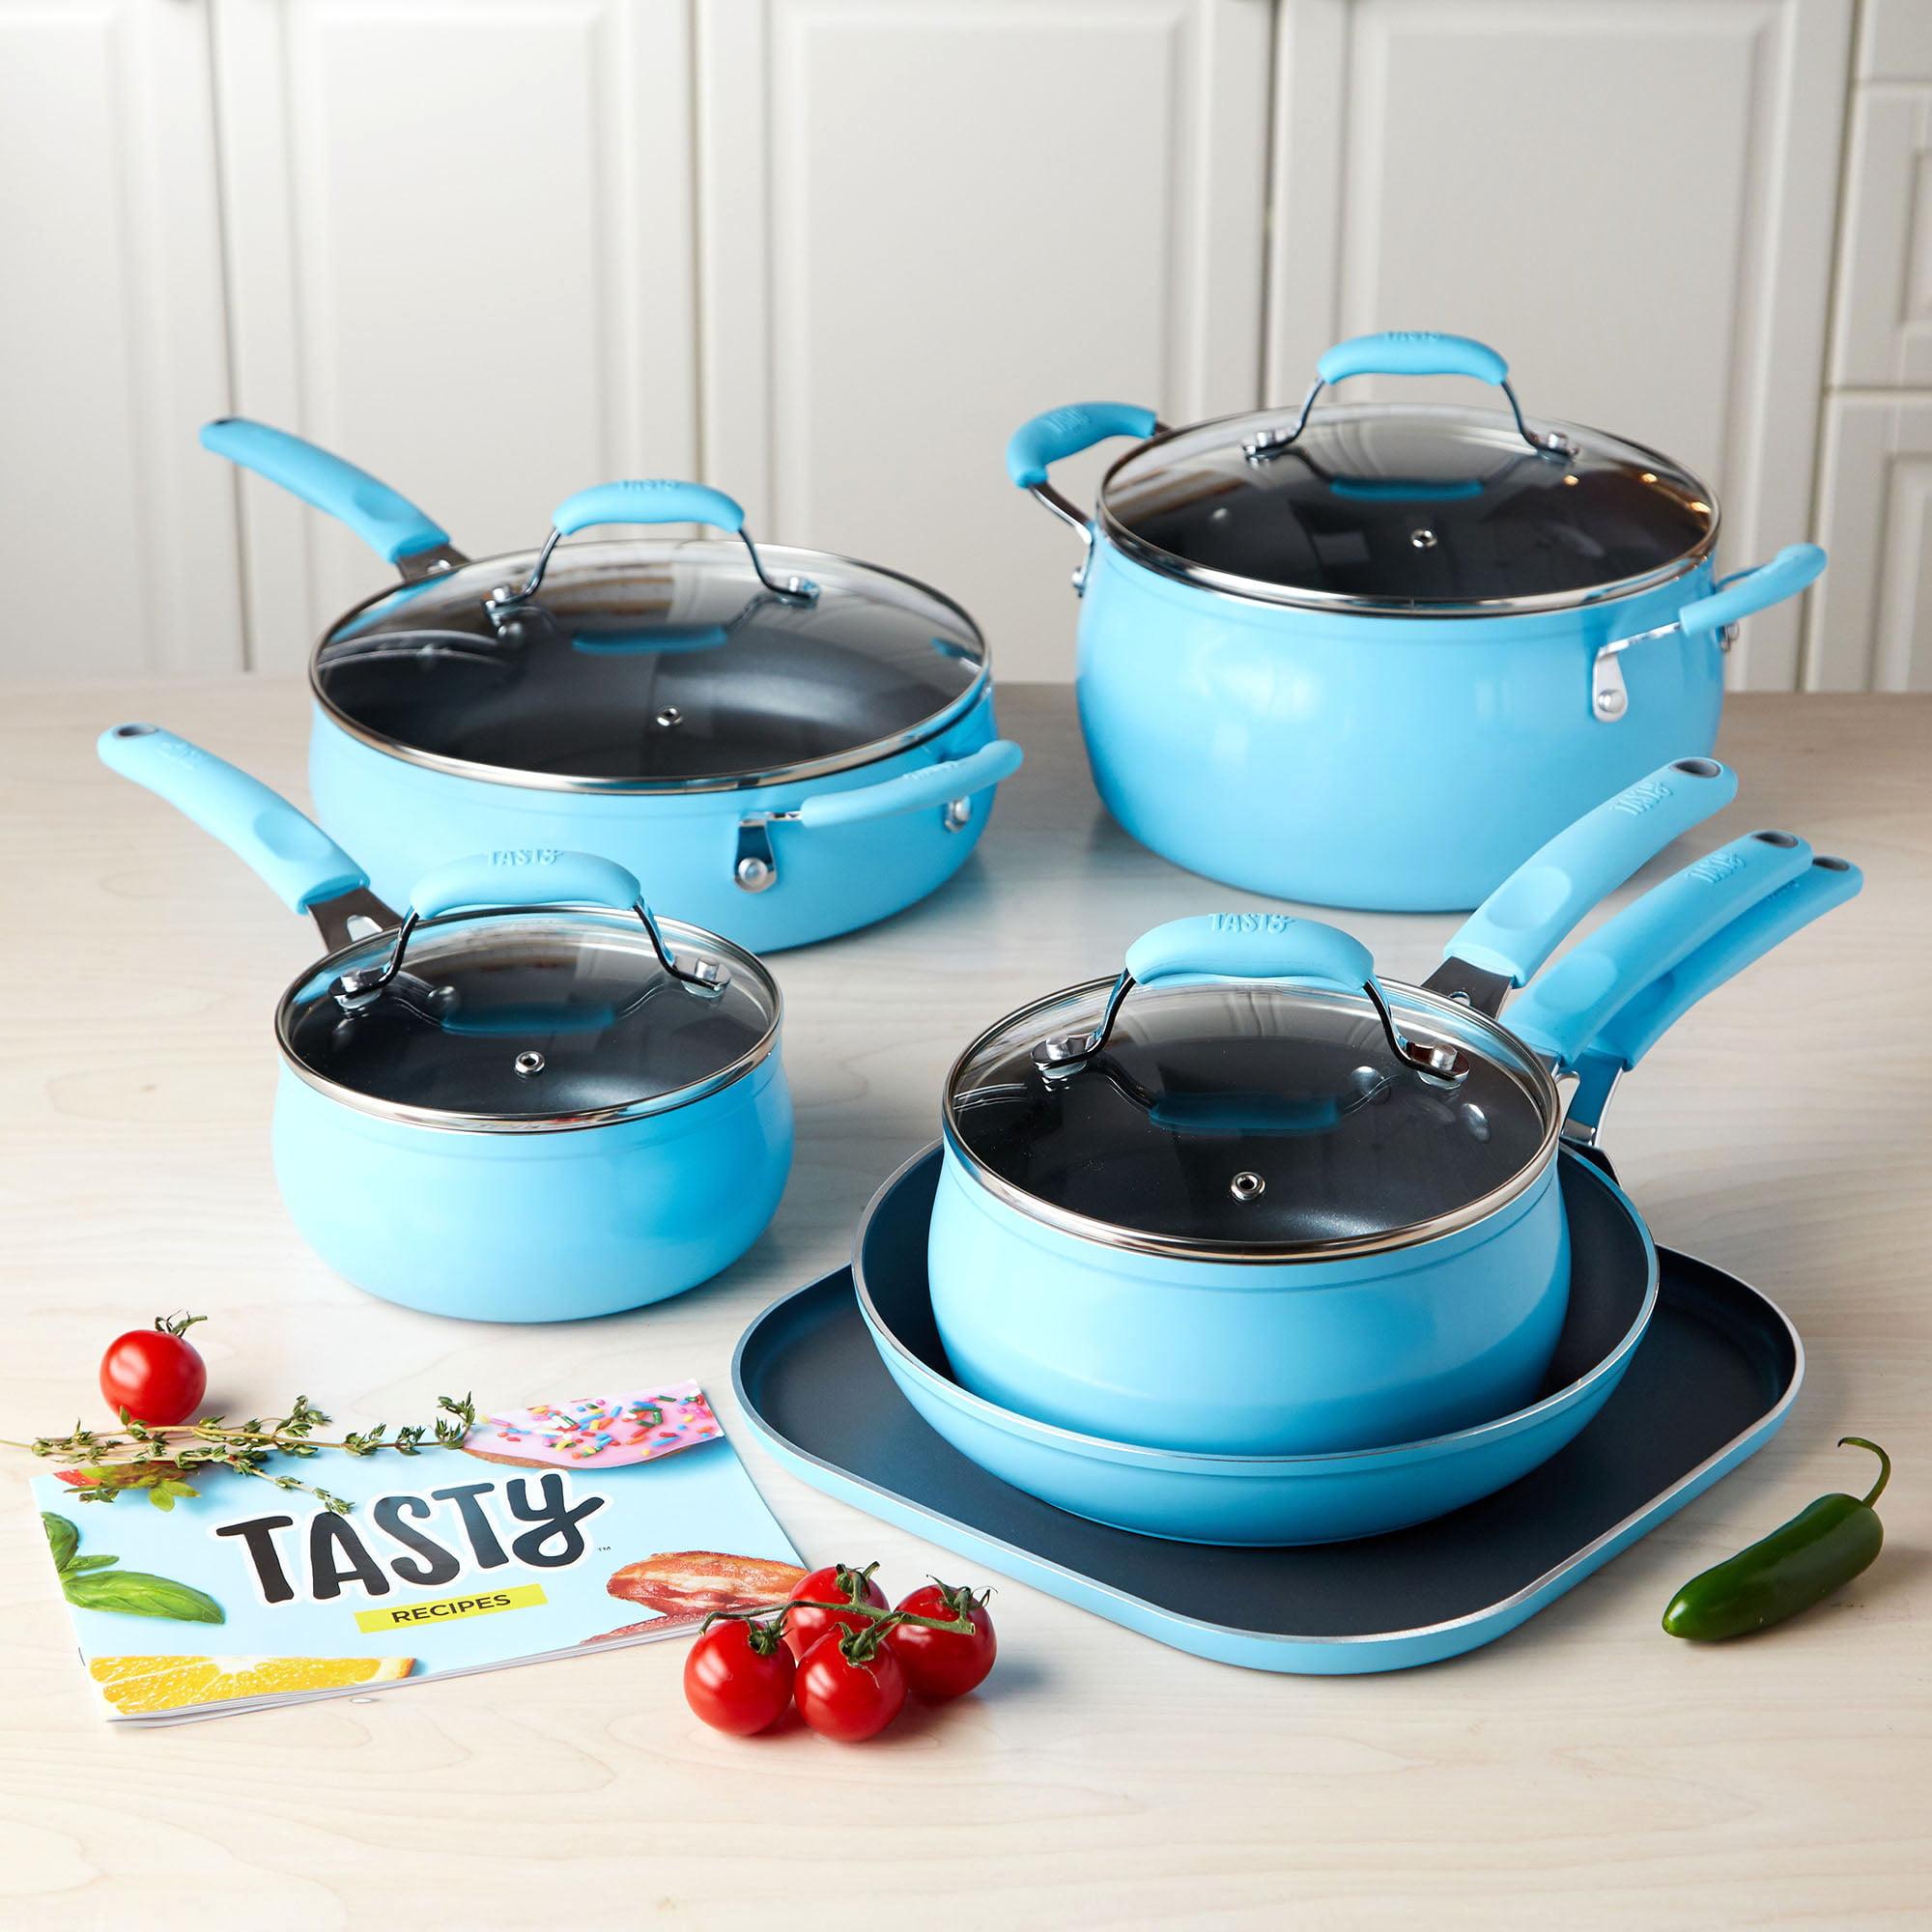 Tasty 11pc Cookware Set Non-Stick - Diamond Reinforced - Blue